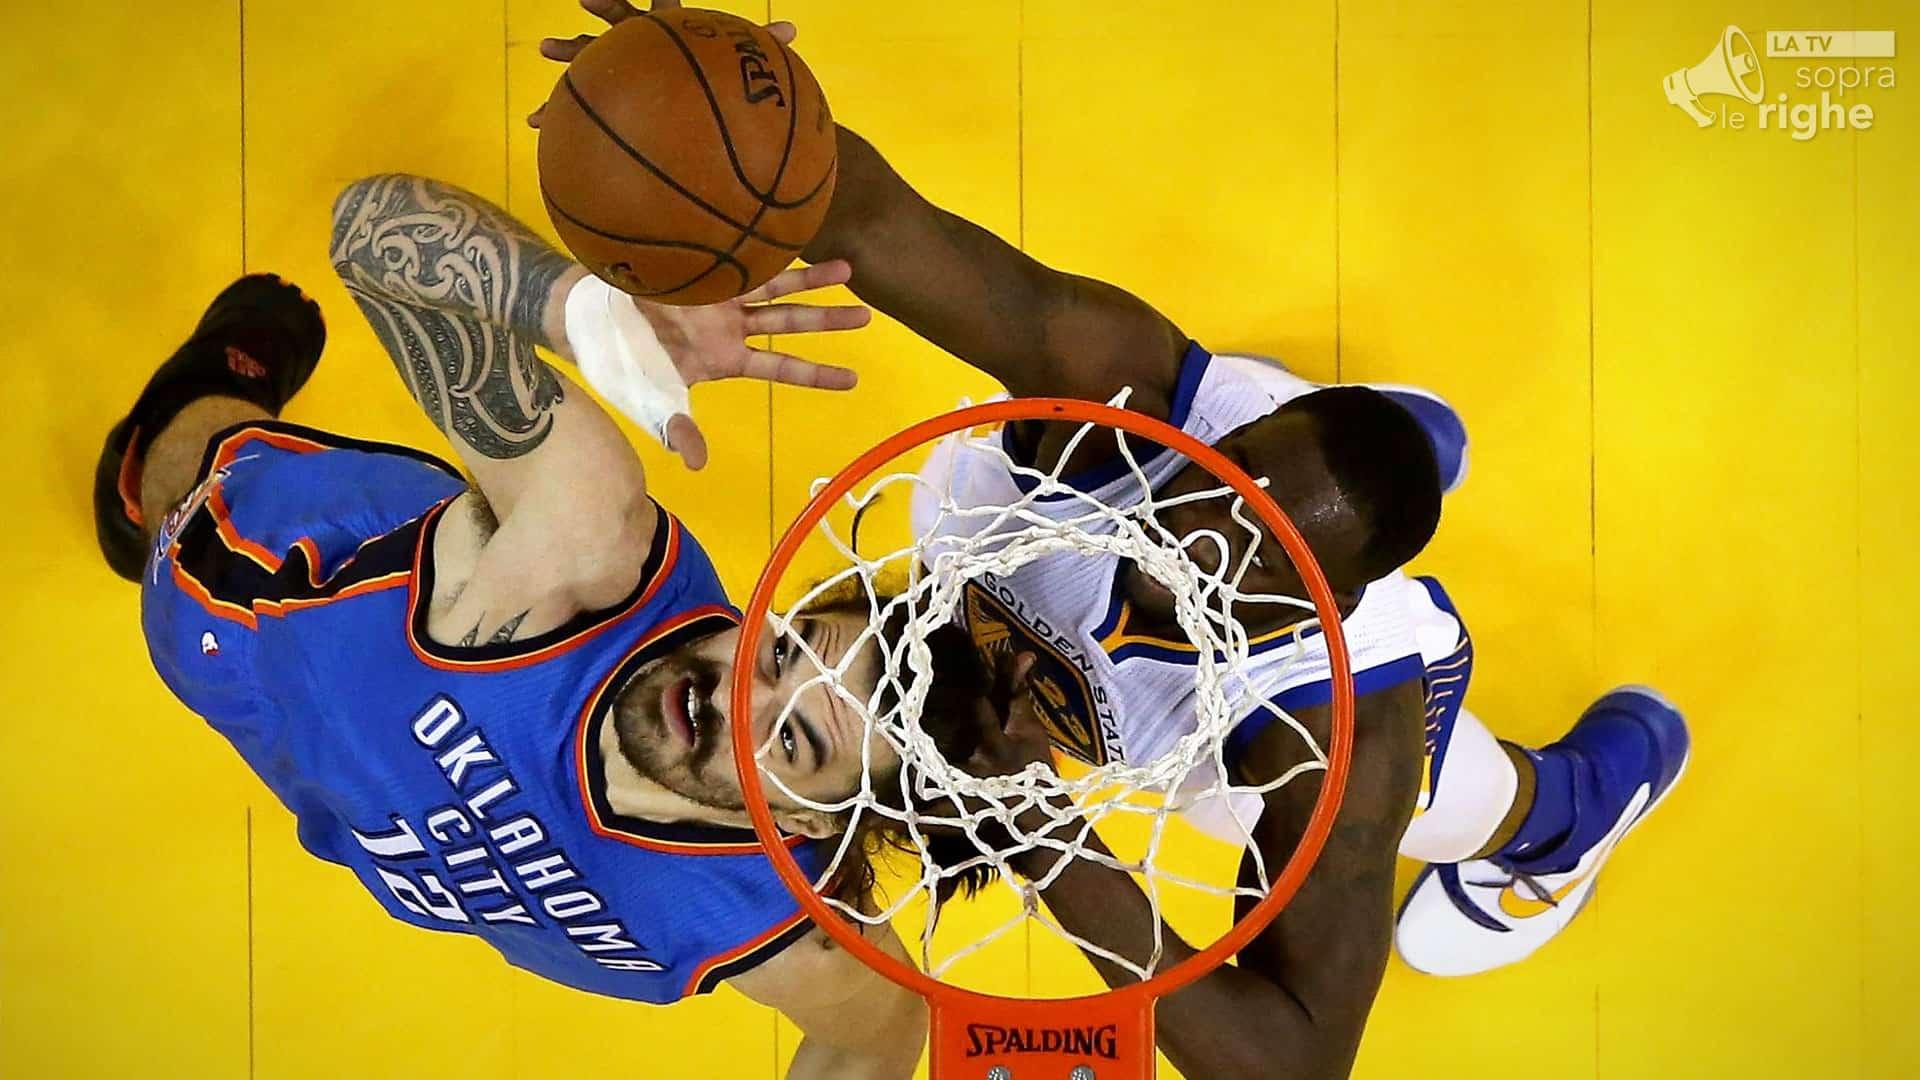 NBA FINALS, ancora Curry Vs Lebron